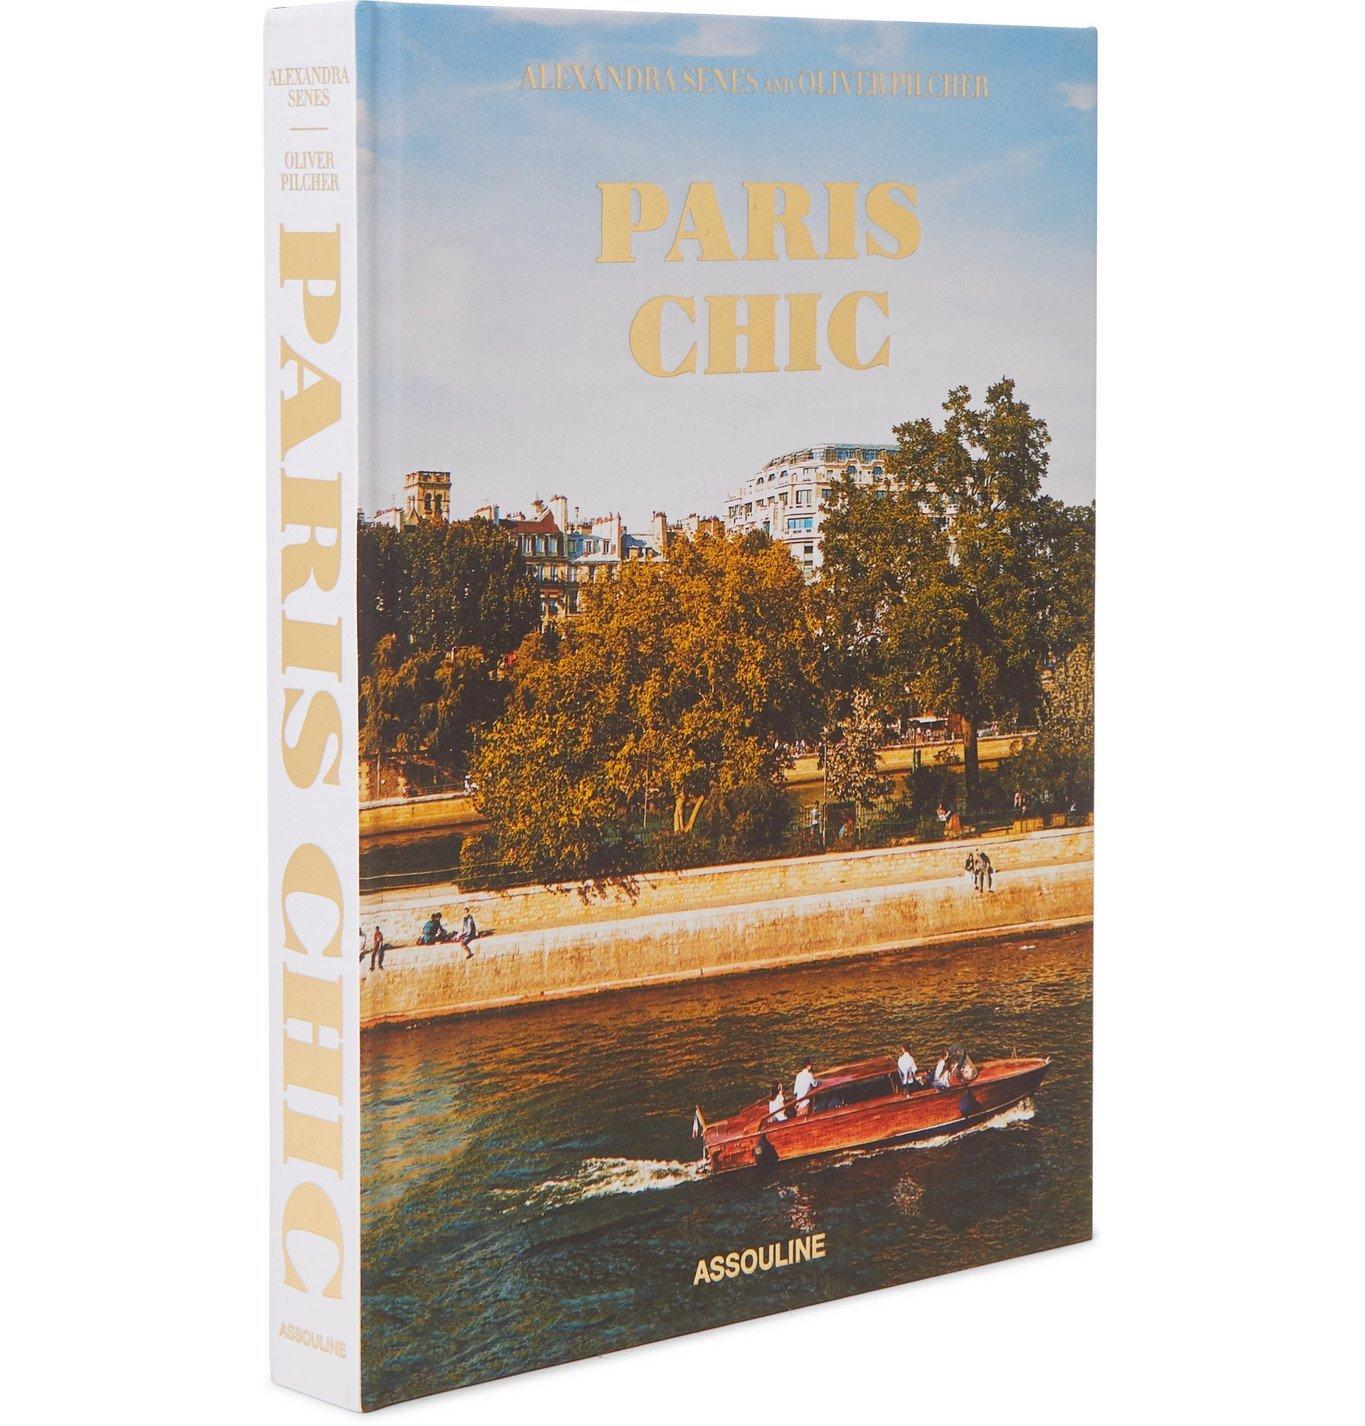 Photo: Assouline - Paris Chic Hardcover Book - Multi